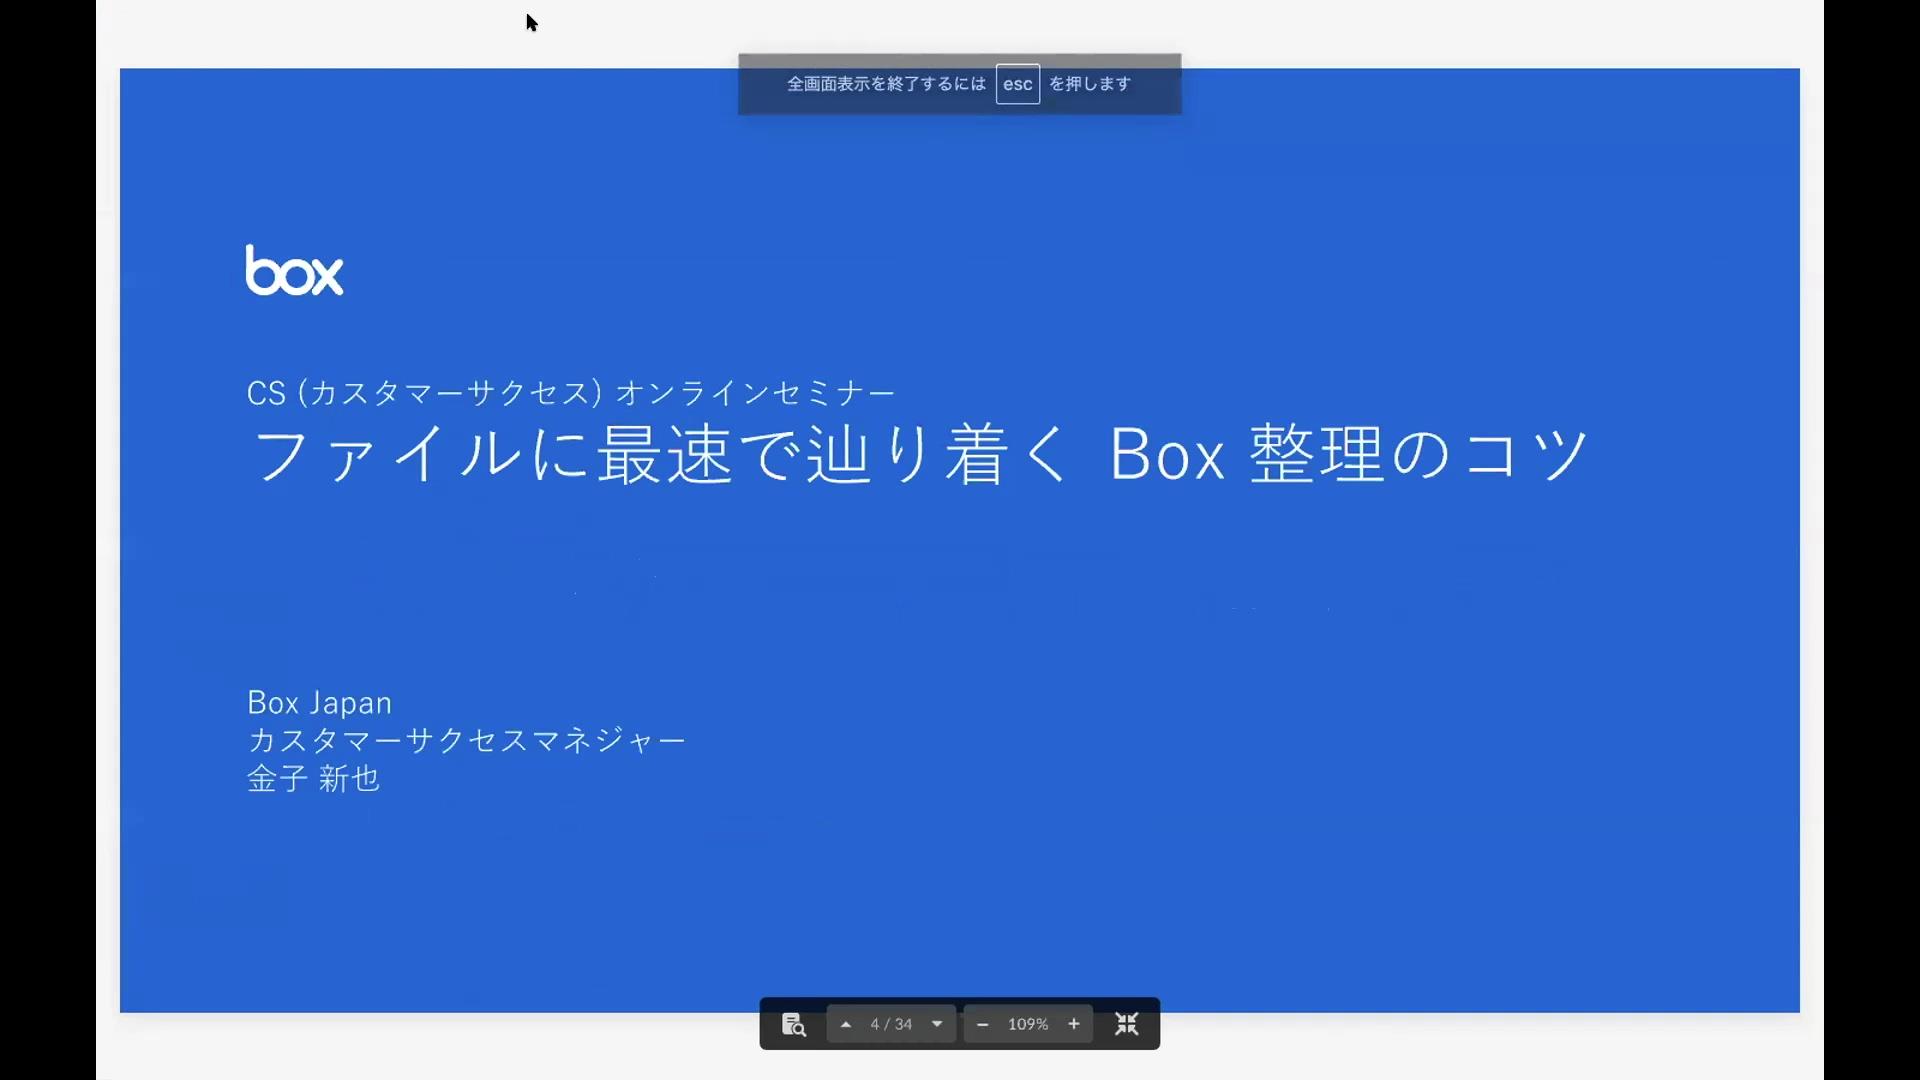 box-mastery-course-part-1